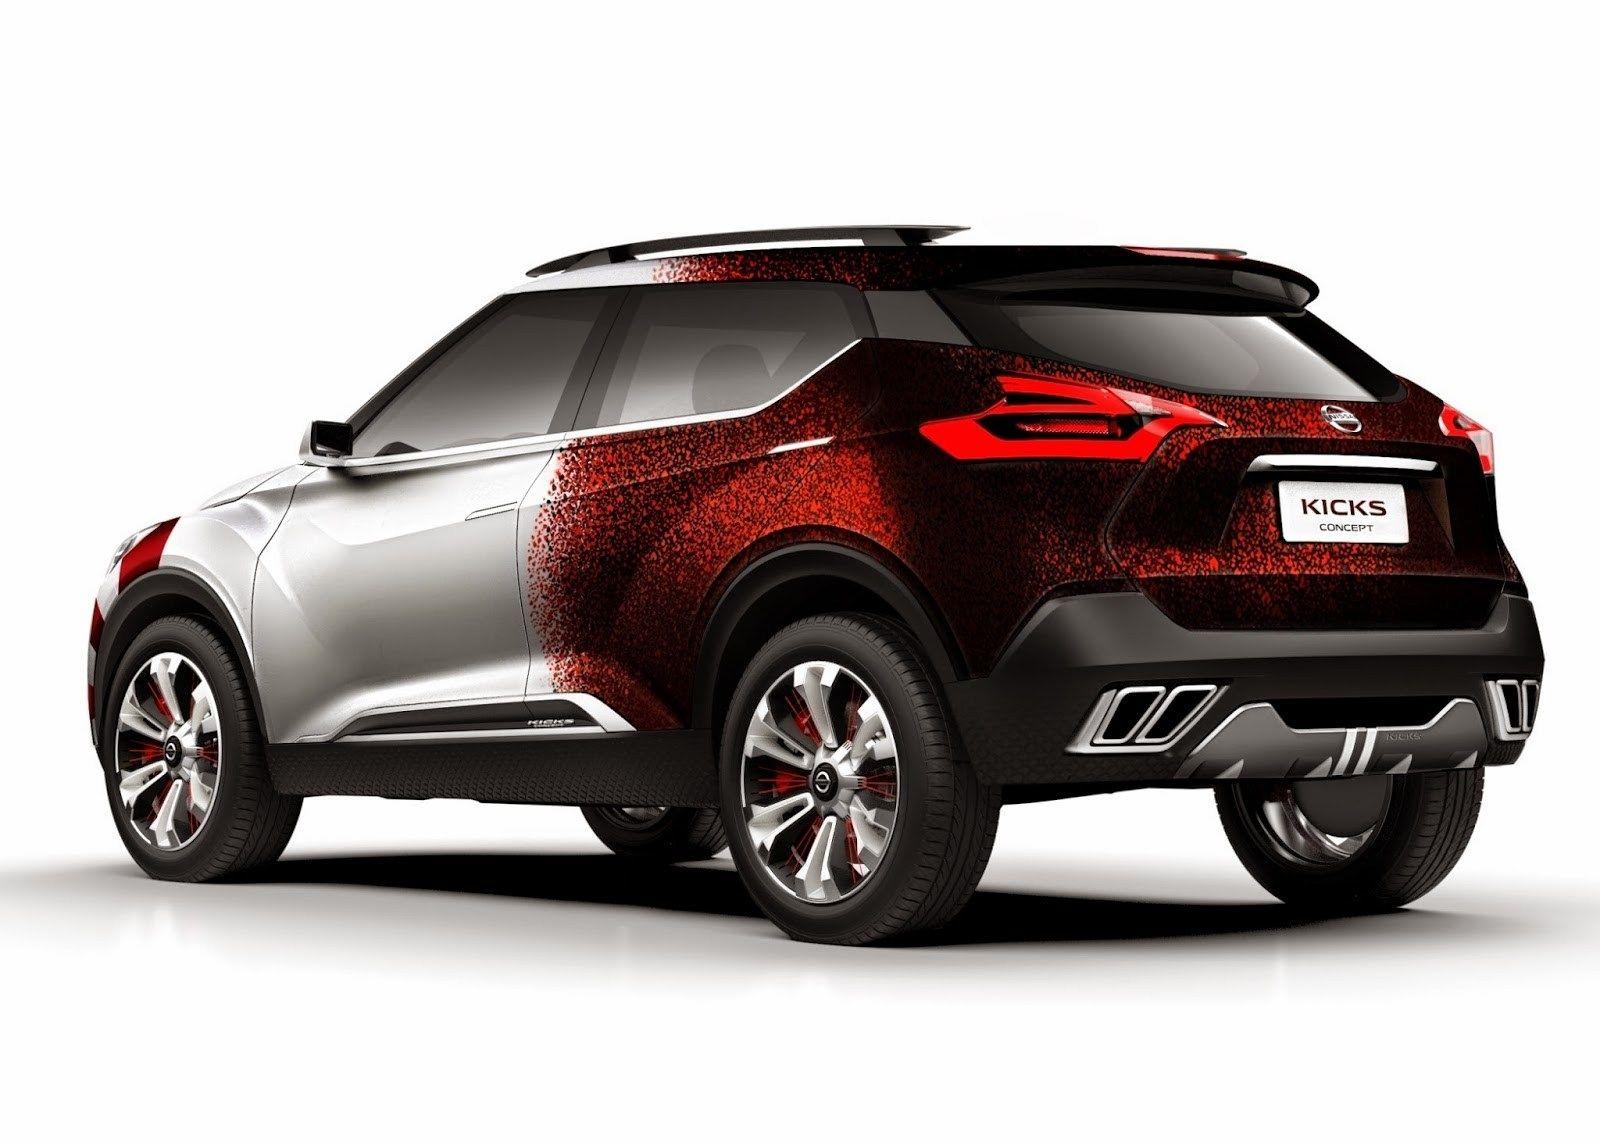 When Will The Nissan Kicks 2020 Interior Look Likelazysundaymag Lazysundaymag Suv Nissan Jeep Suv